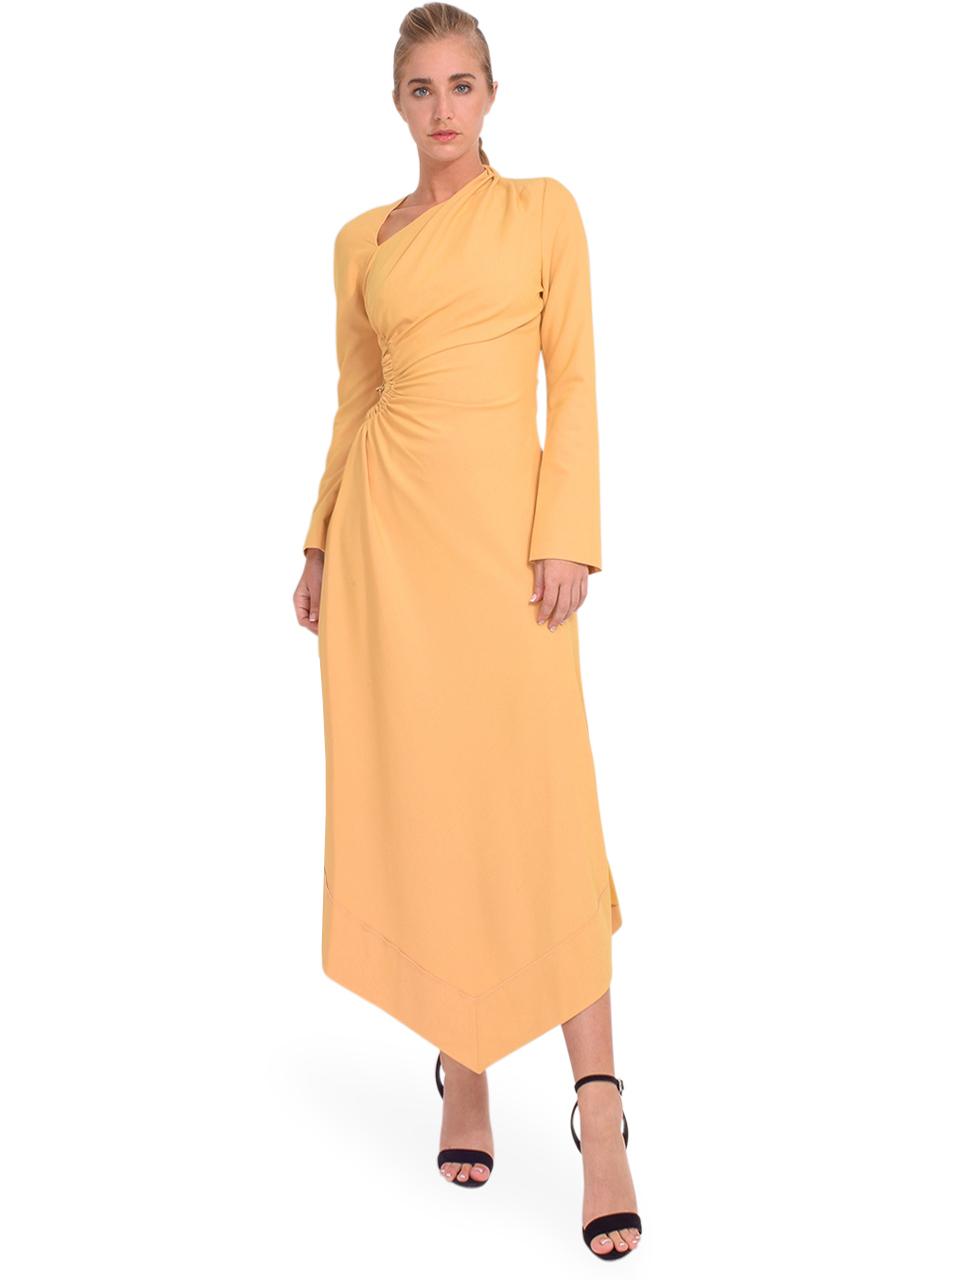 Jonathan Simkhai Christie Draped Cutout Dress in Honey Front View